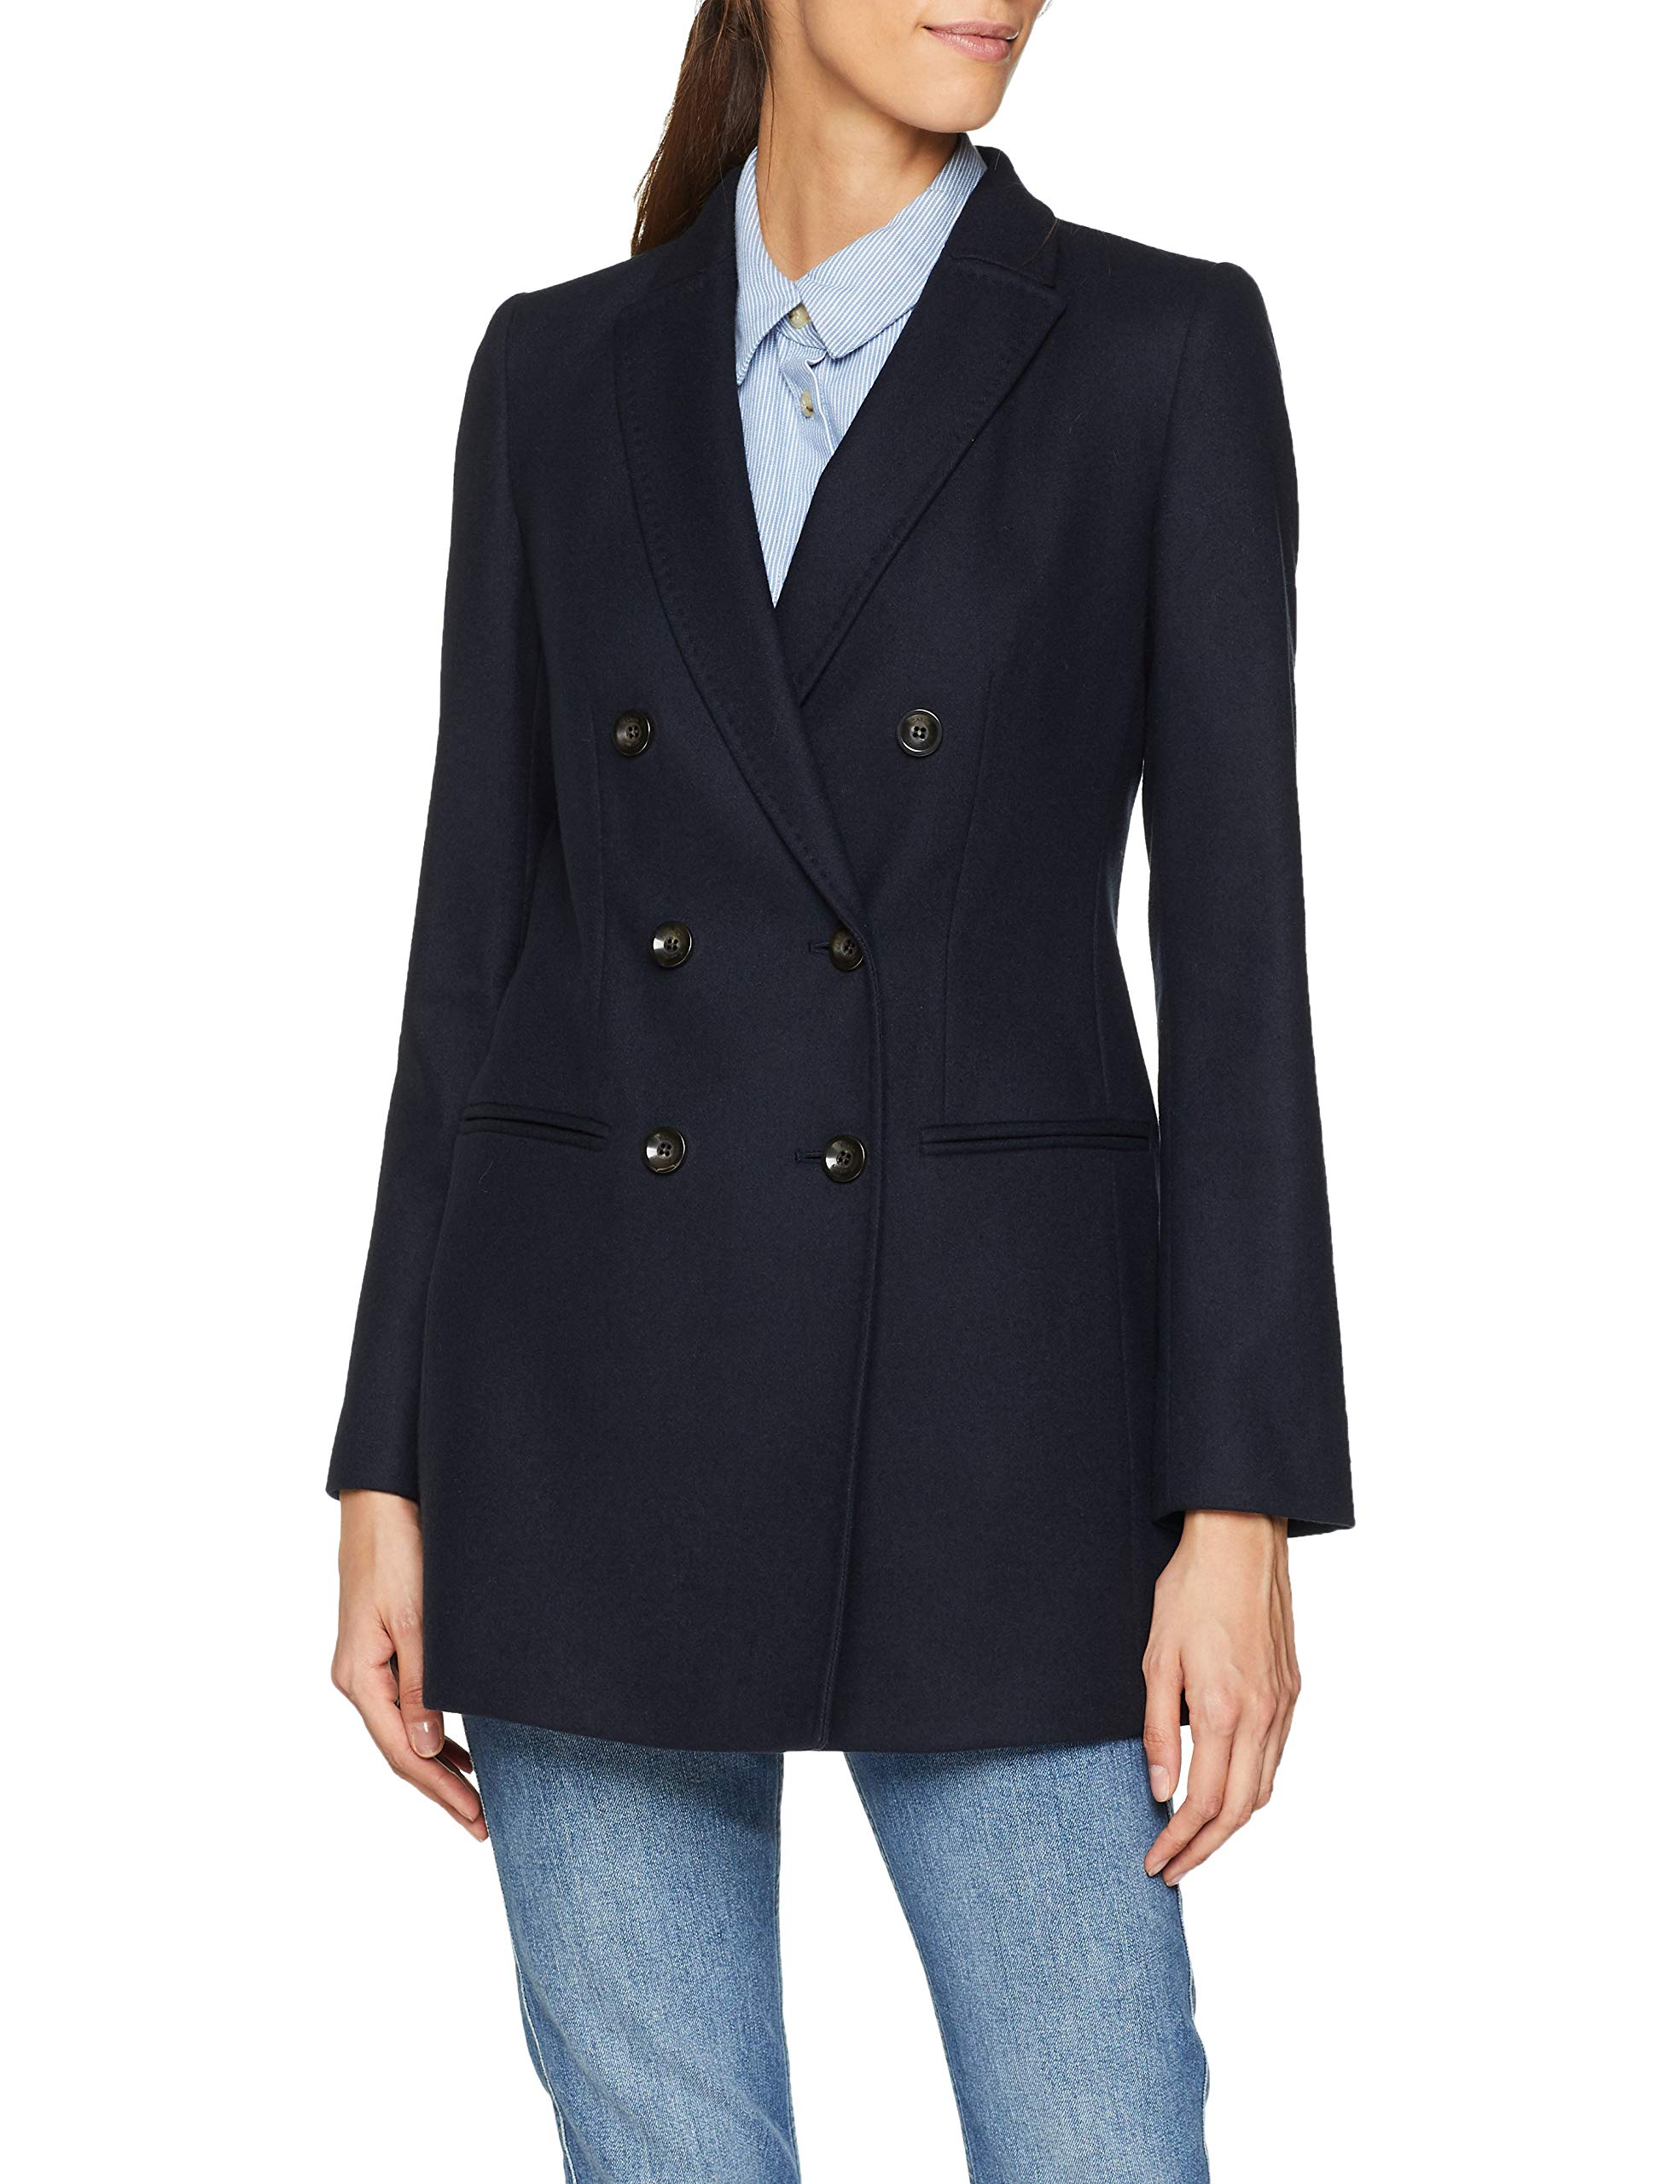 Longline Millen BlousonBleunavy36taille FabricantUk Jacket Karen 8Femme Db 3RqAL45j